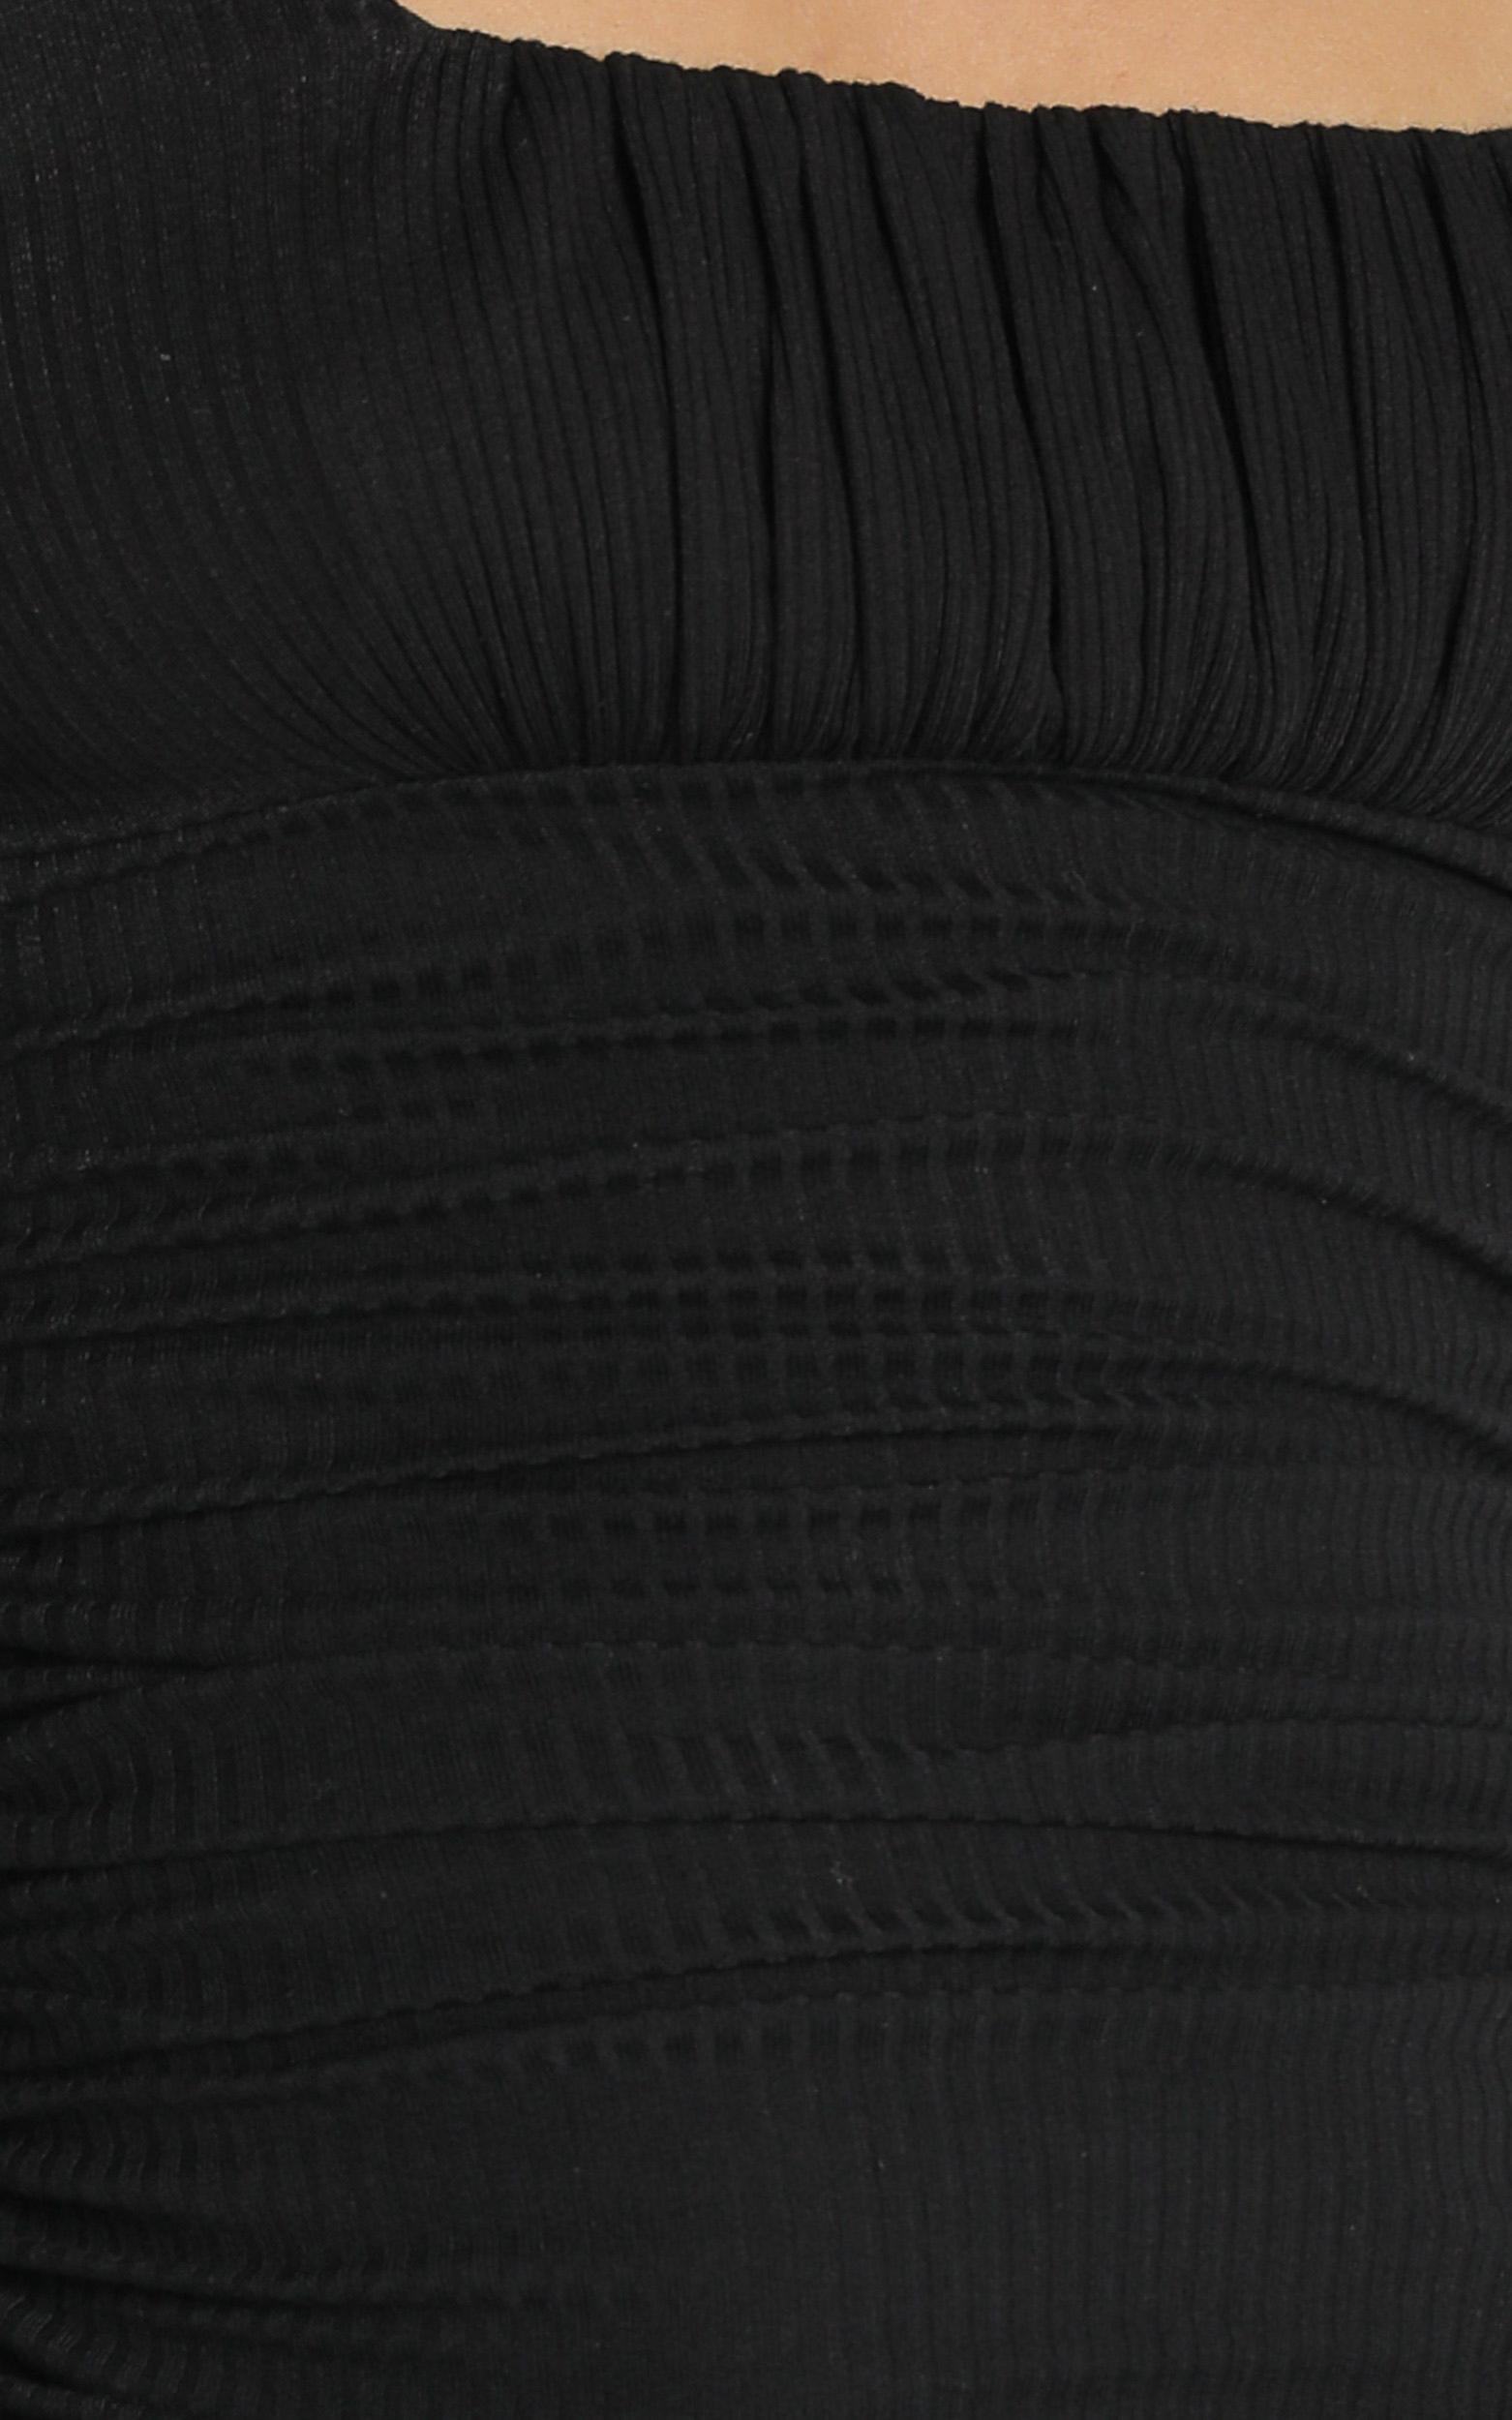 Farris Dress in Black - 6 (XS), Black, hi-res image number null